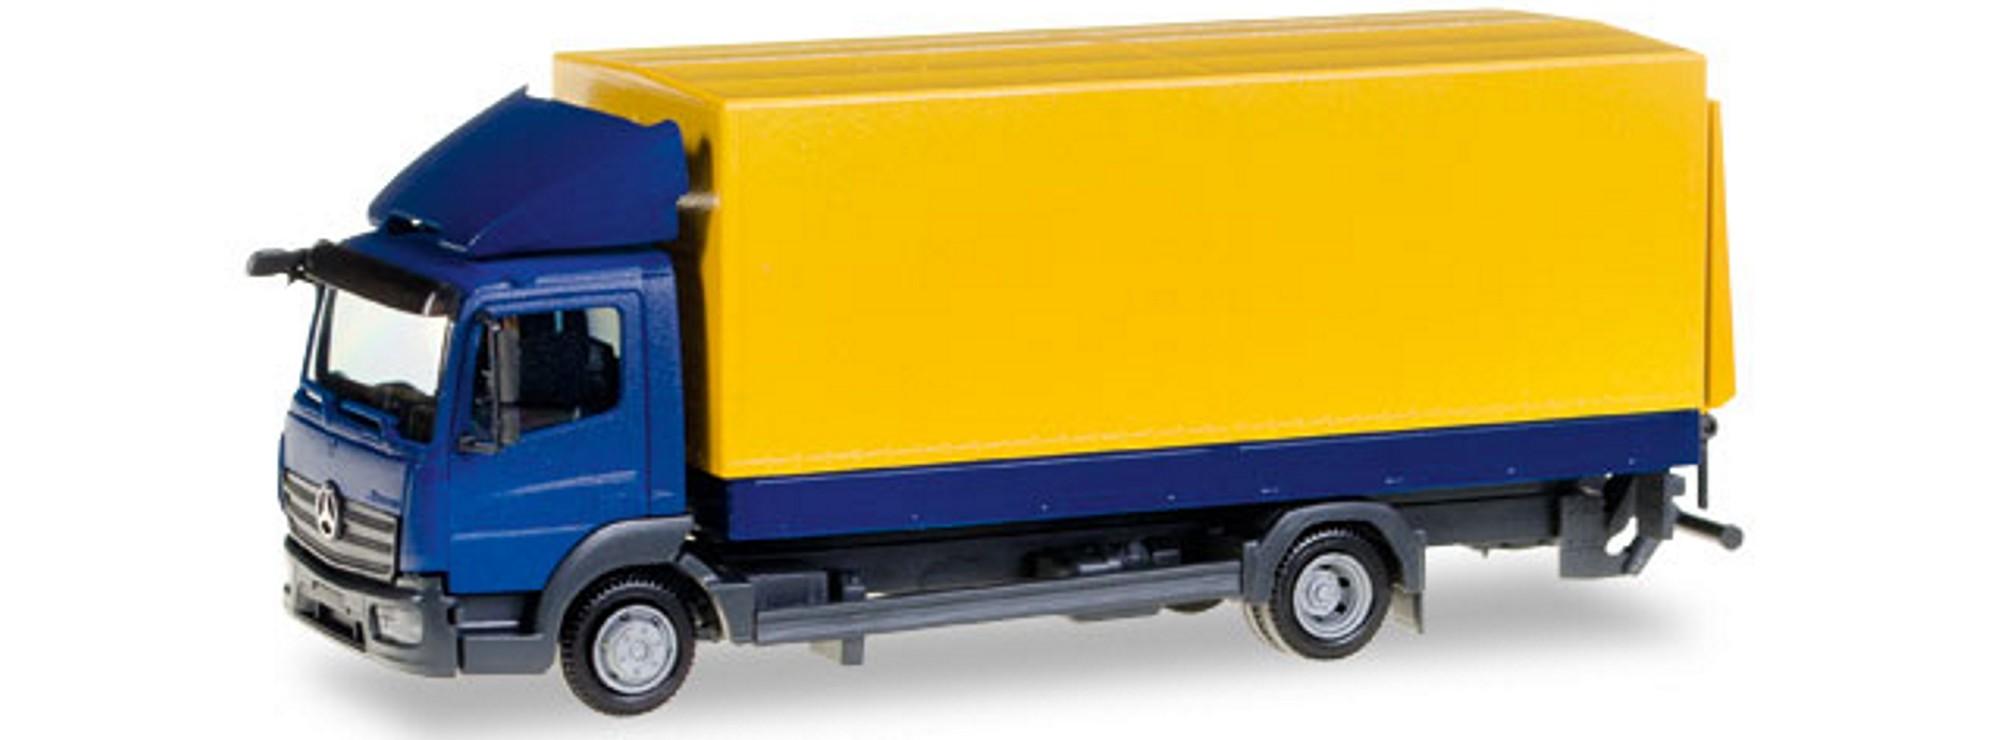 Herpa LKW MB Atego Planen-LKW blau-gelb 307420